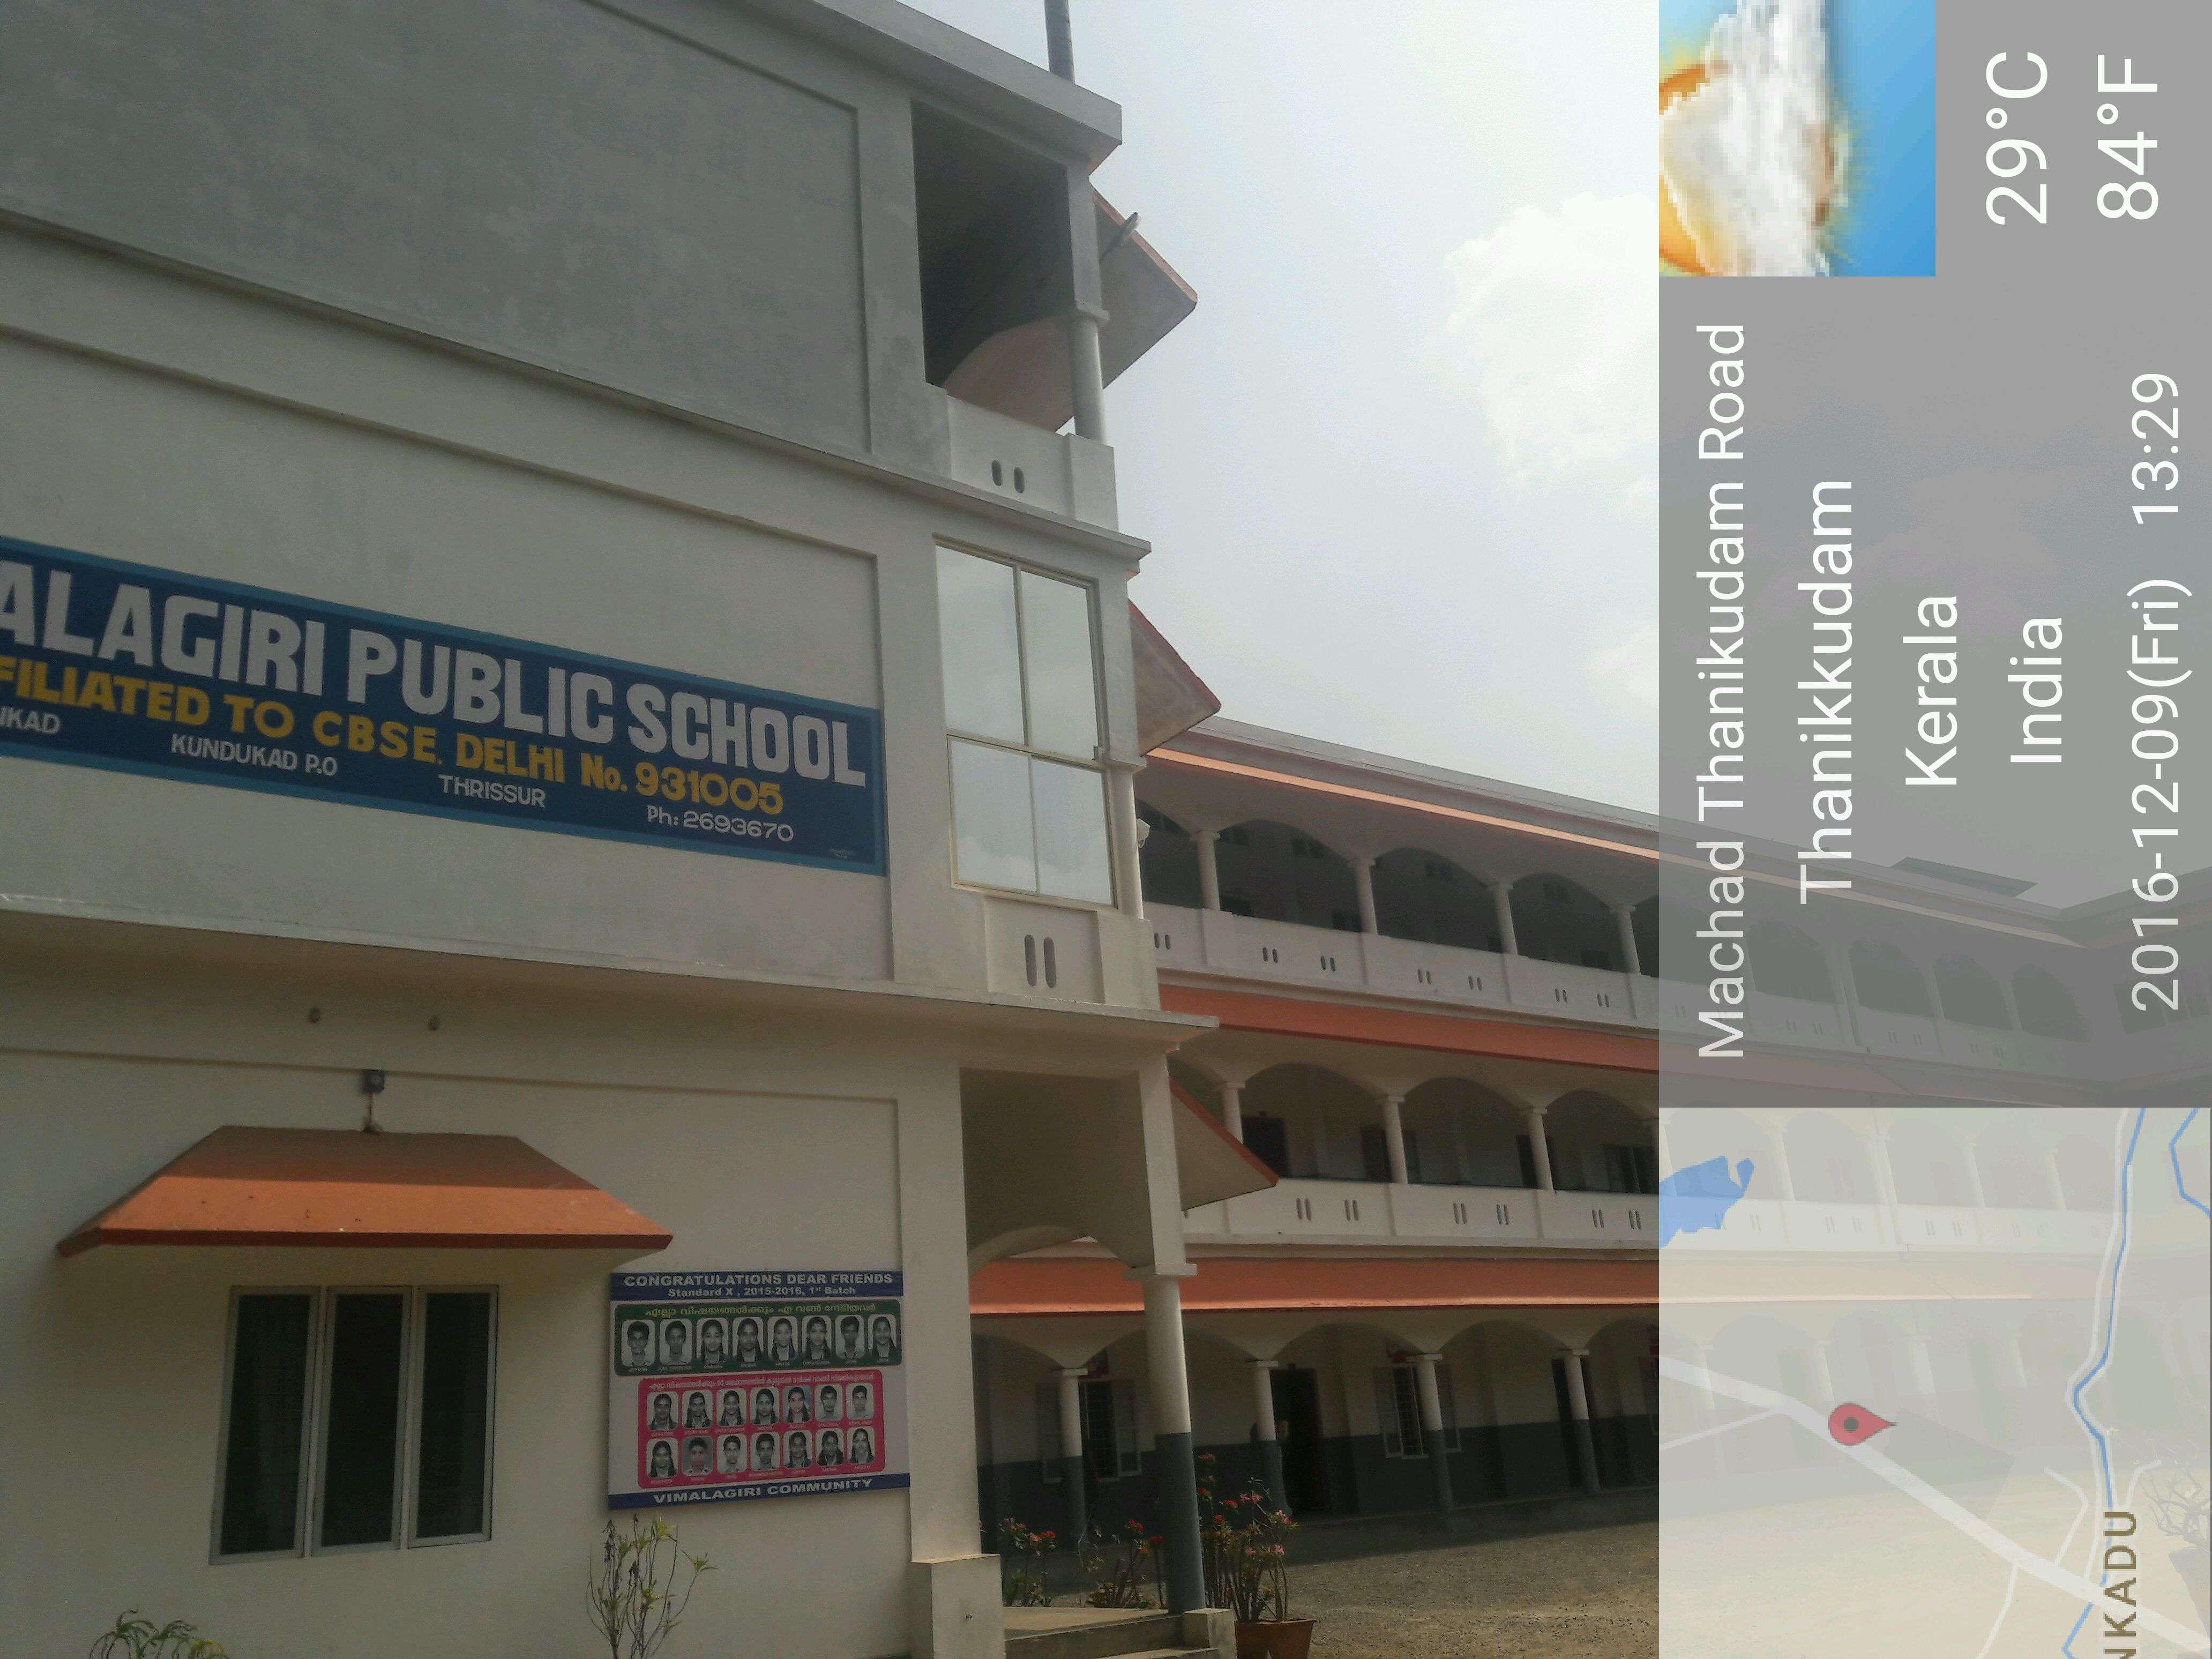 Vimalagiri Public School Vimalagiri Public School KundukadP O Karuvankad Thrissur Kerala 931005